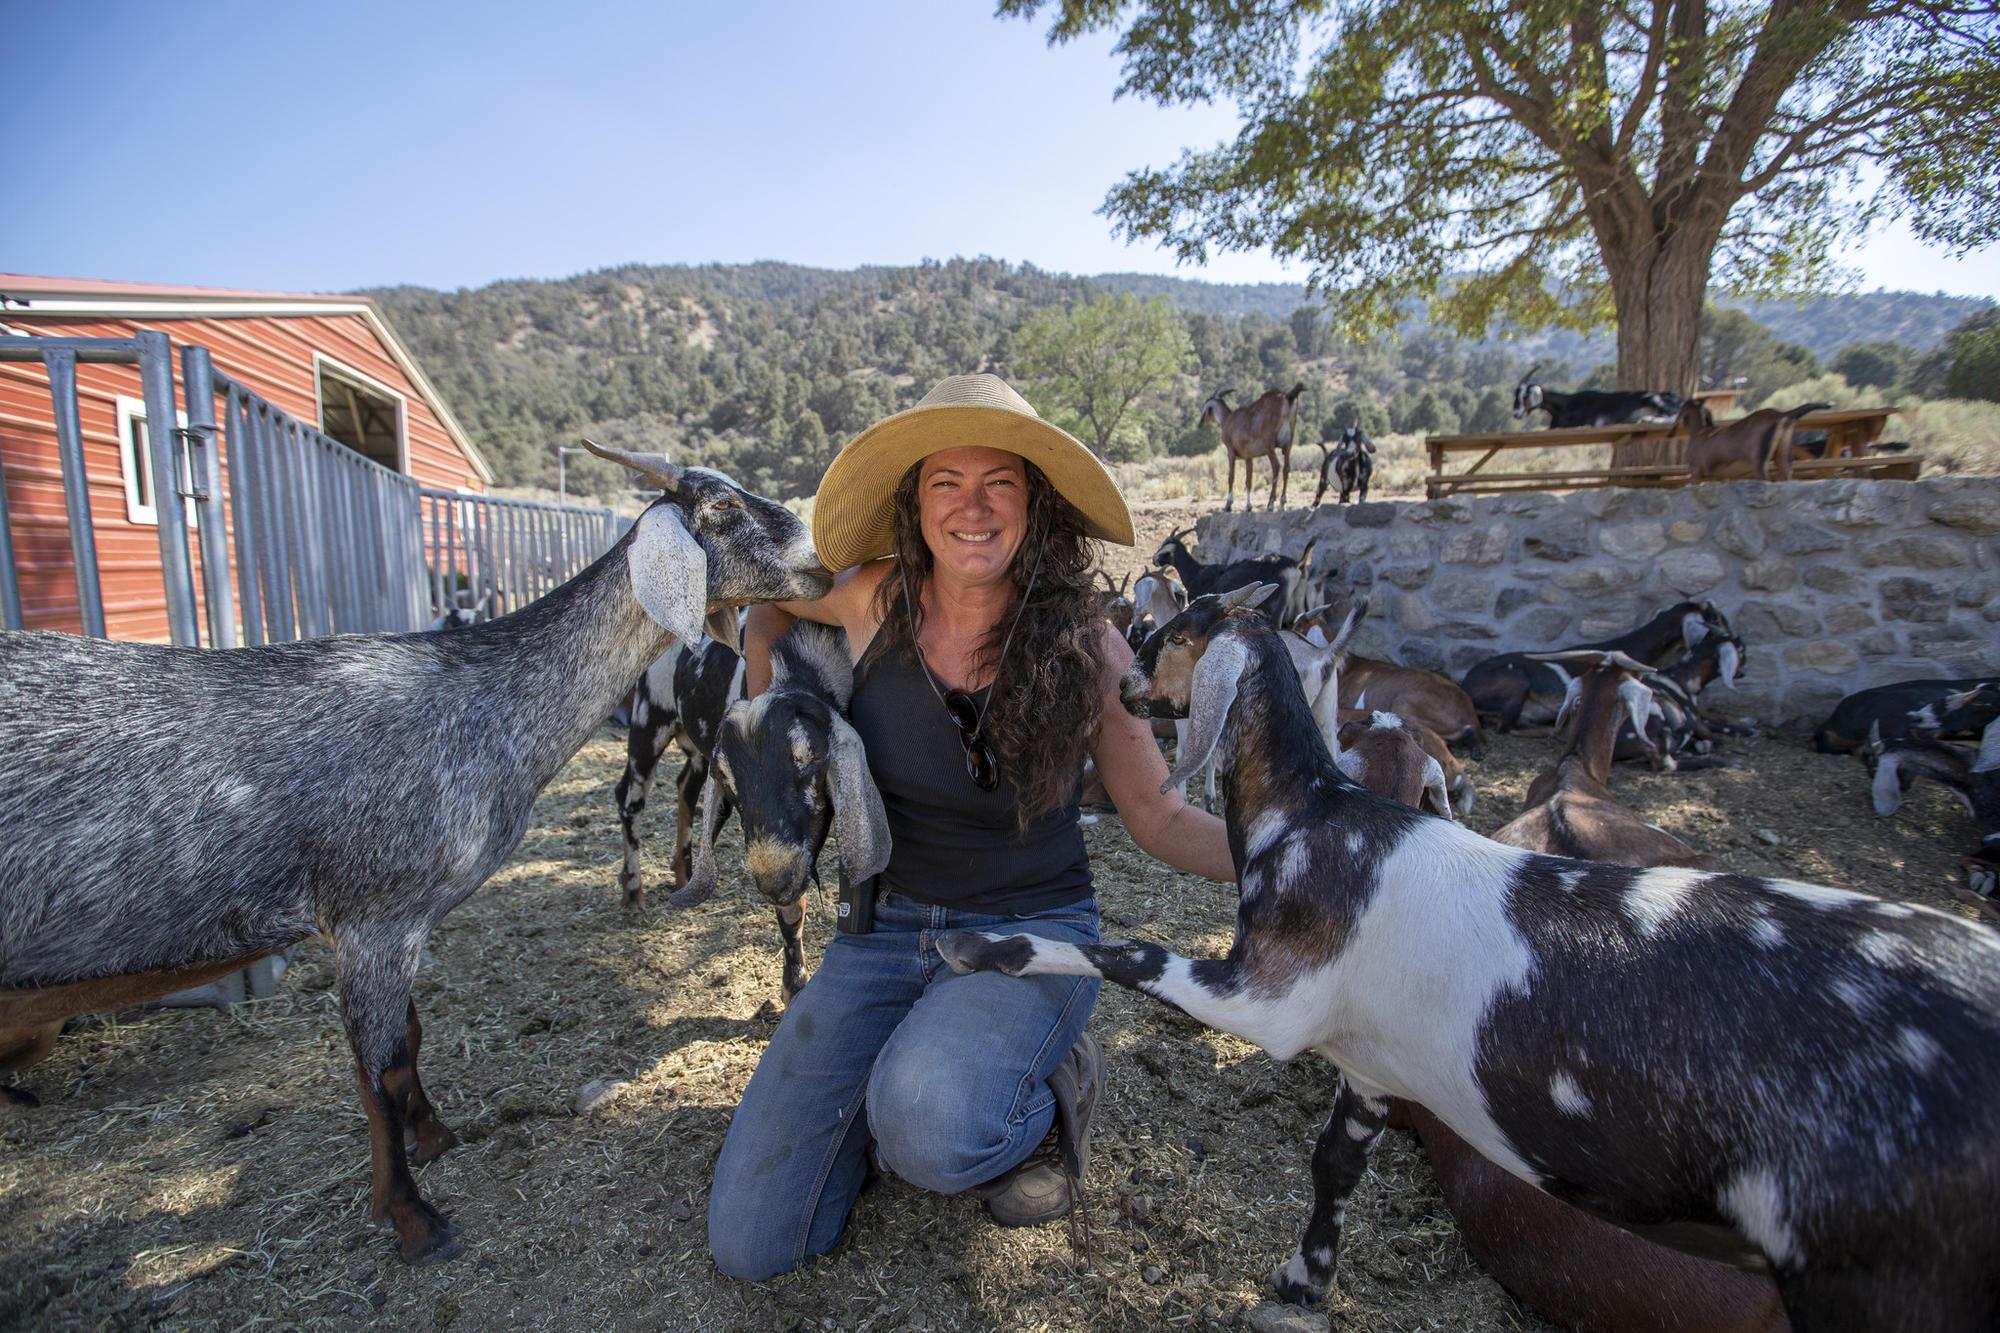 3055047_FO_angeles-crest-creamery-goat-farm_AJS